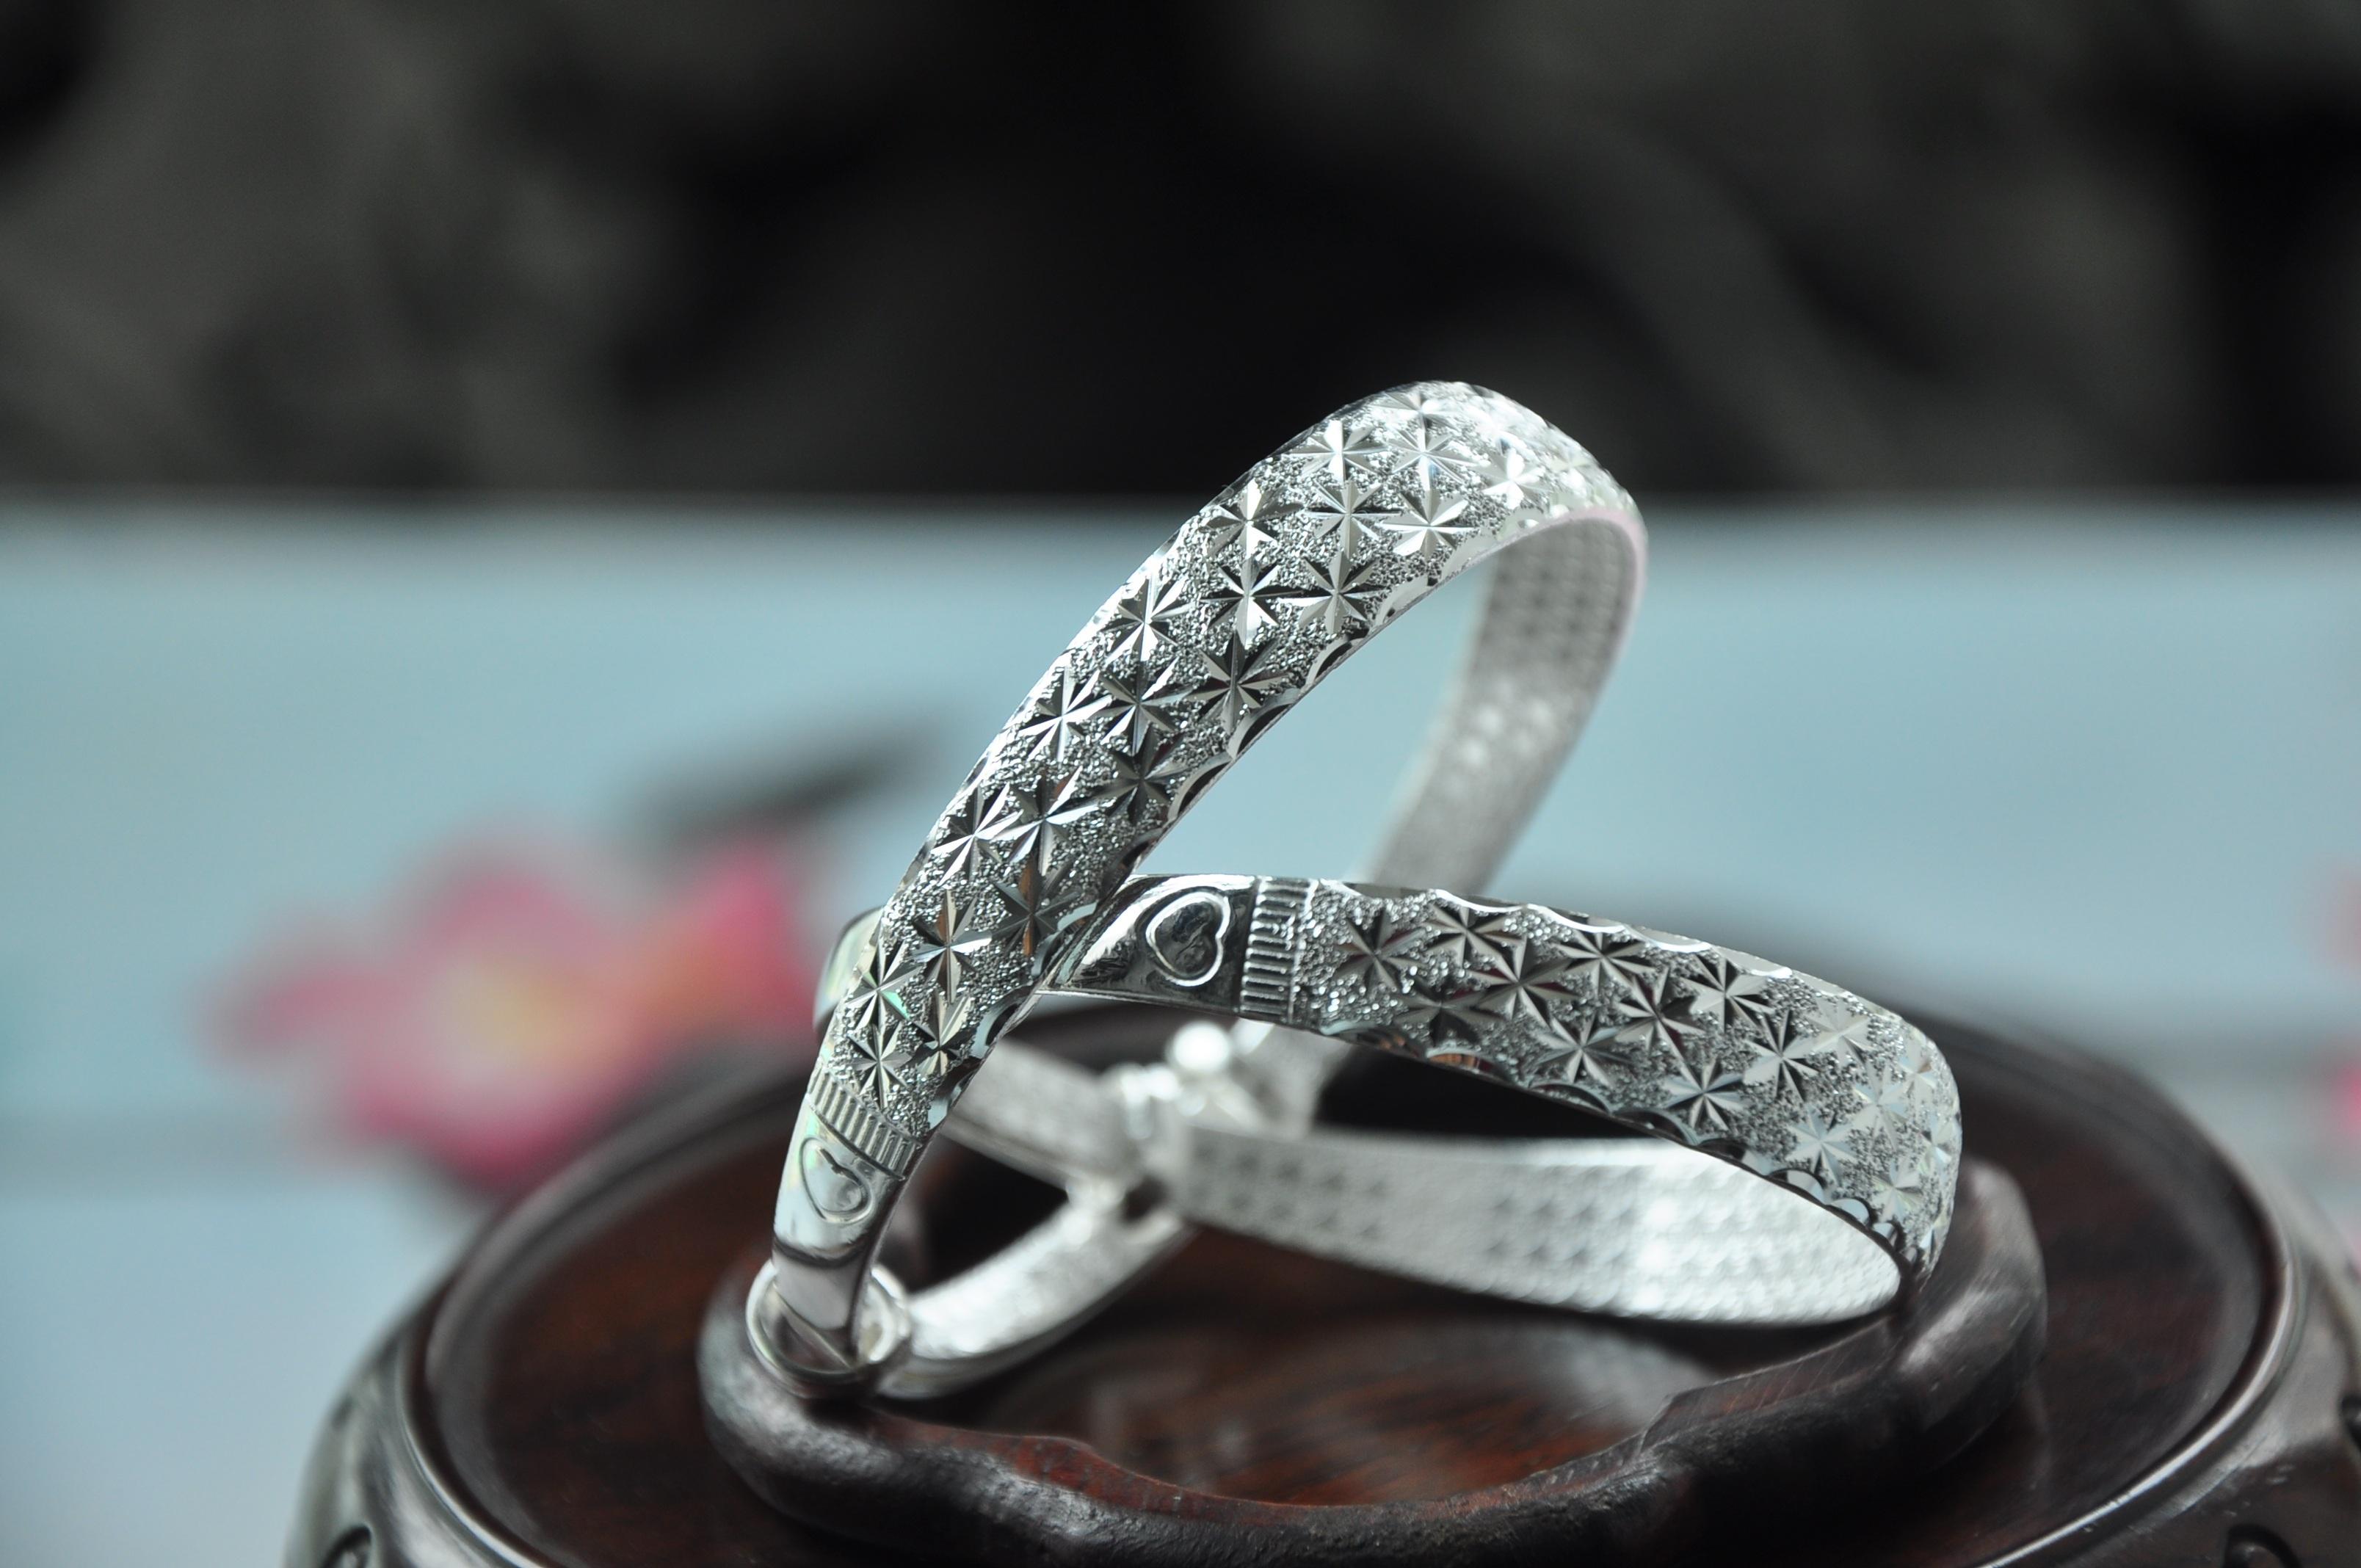 Free Images : hand, metal, baby, bracelet, wedding ring, close up ...